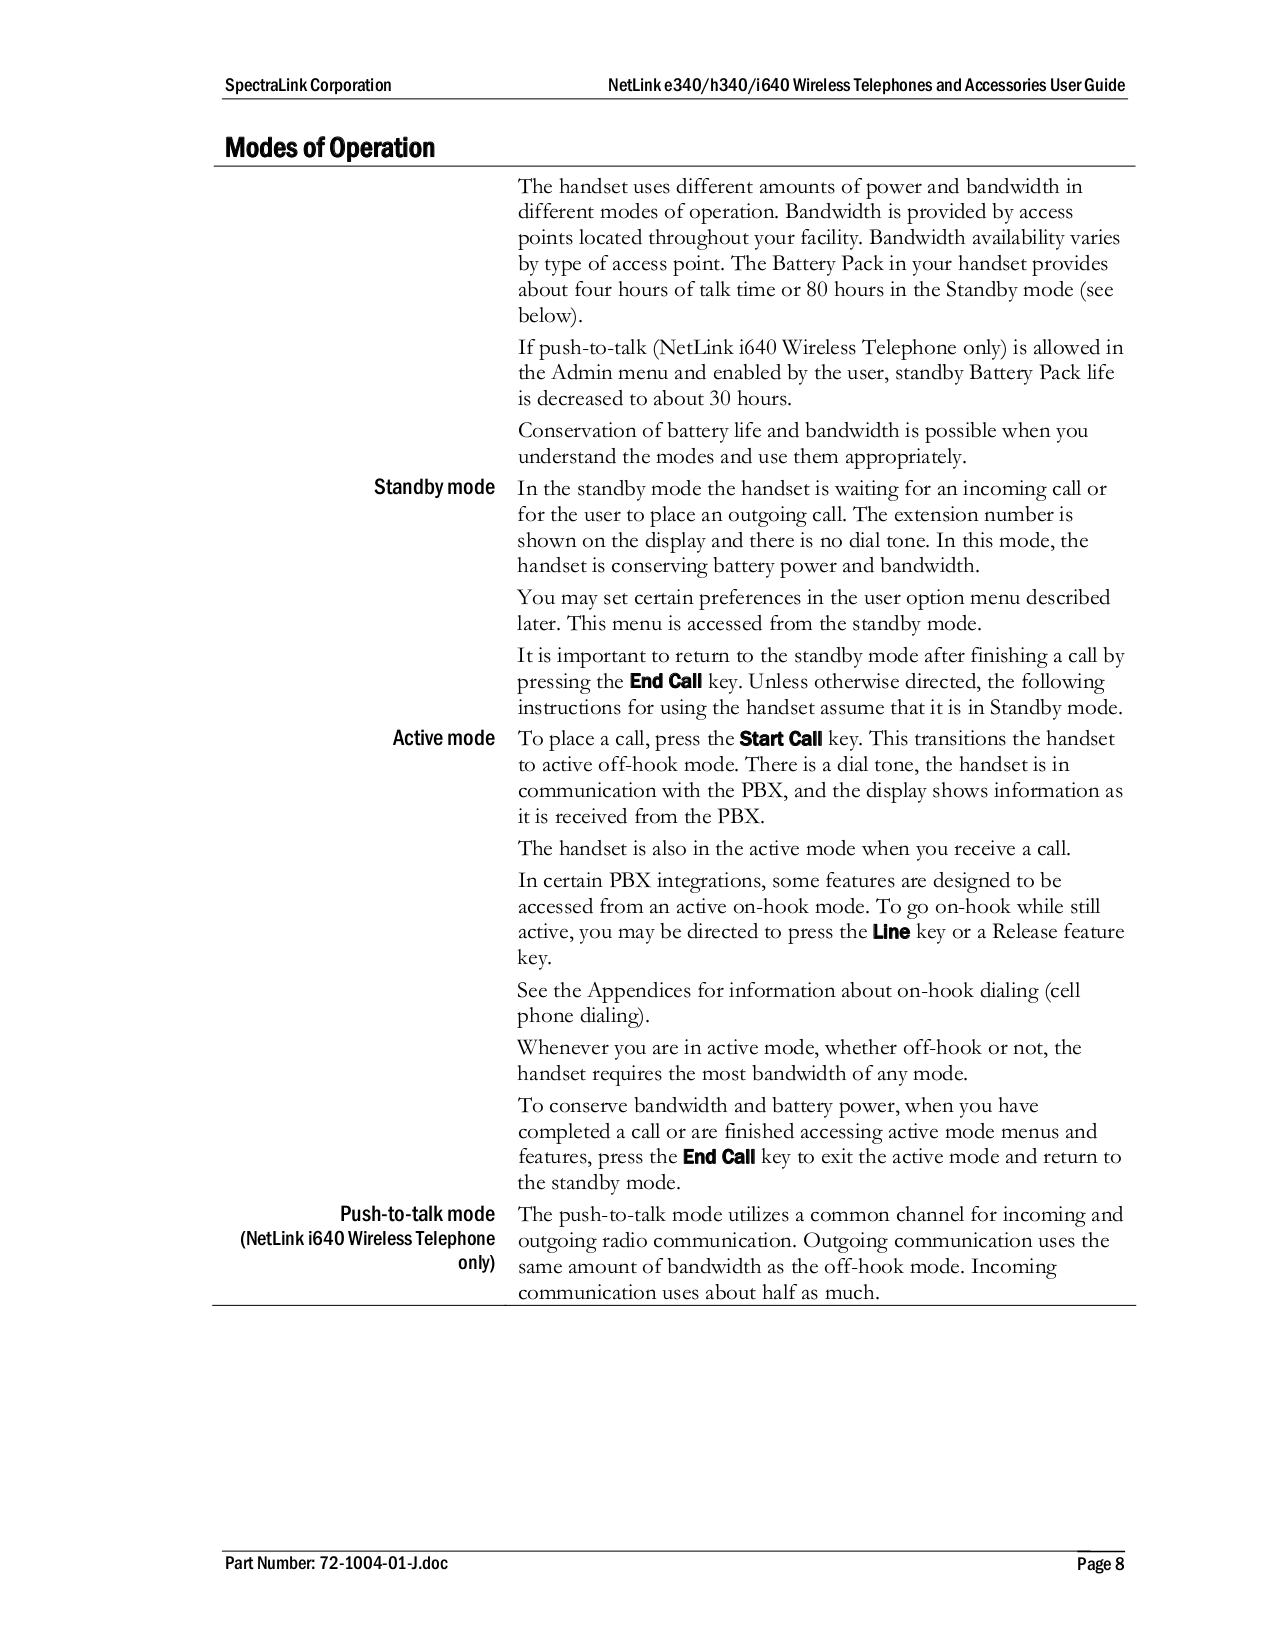 PDF manual for SpectraLink Other NetLink GCX100 Battery Charger